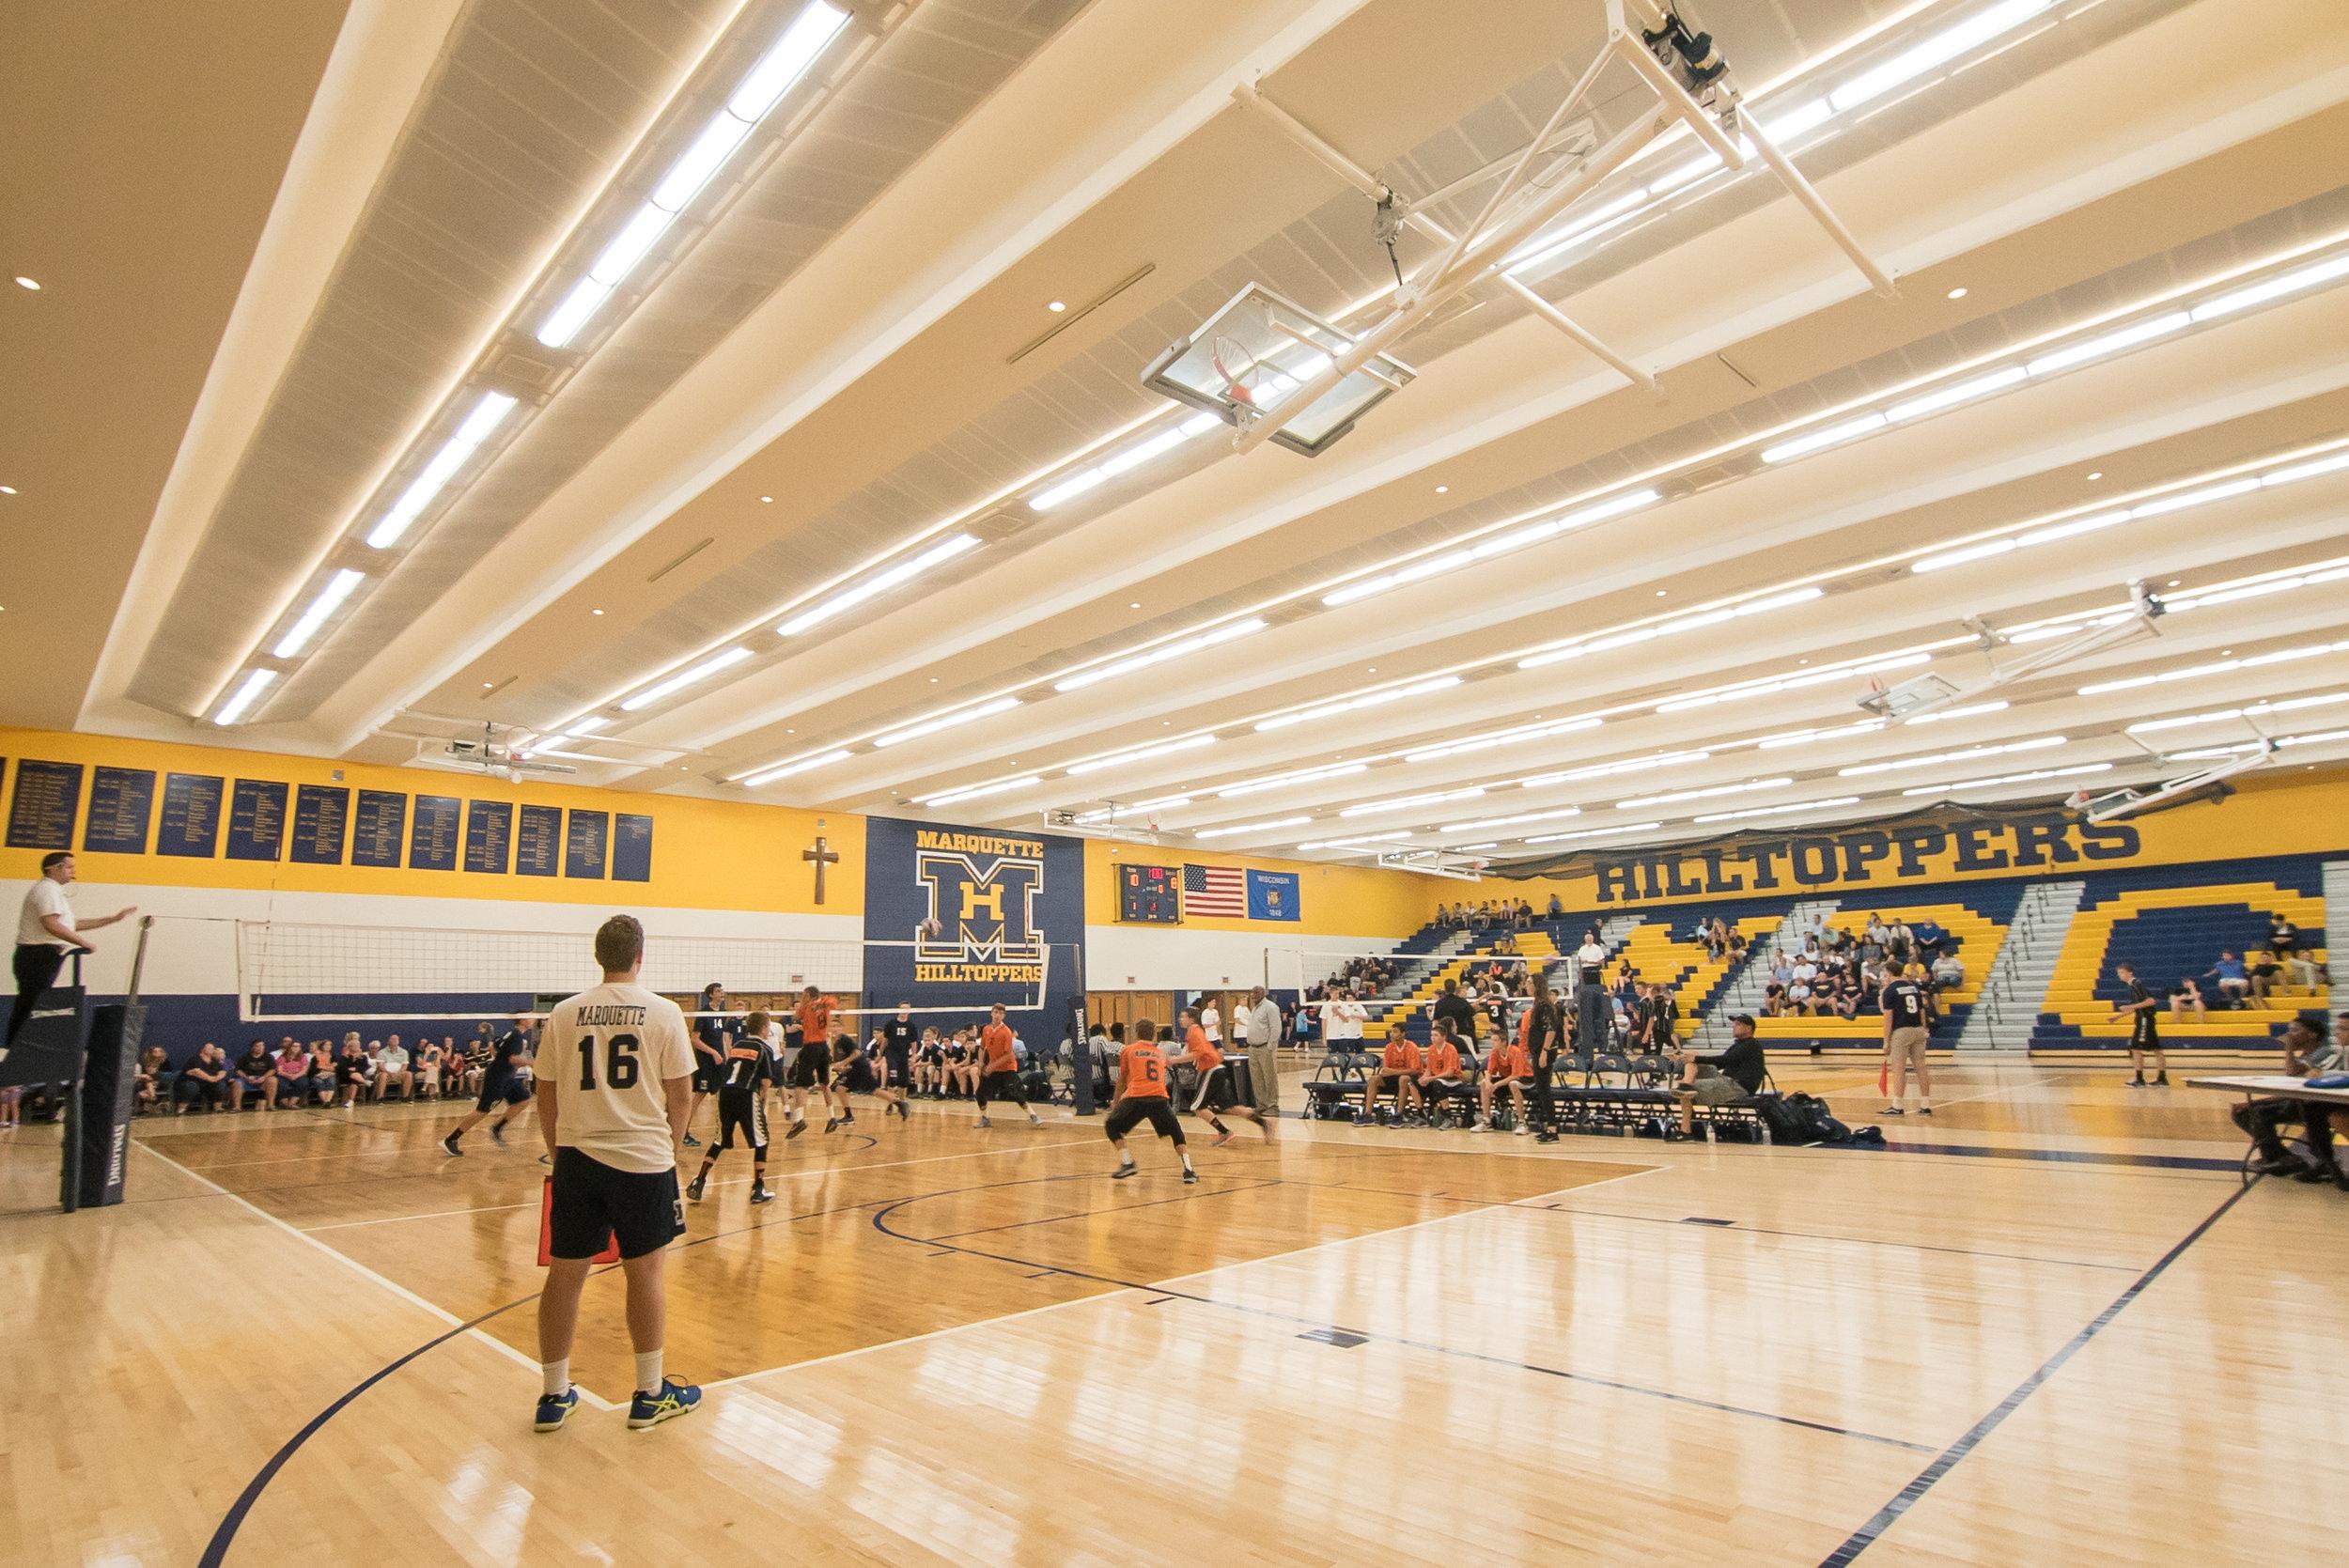 MUHS Gym previews-8.jpg